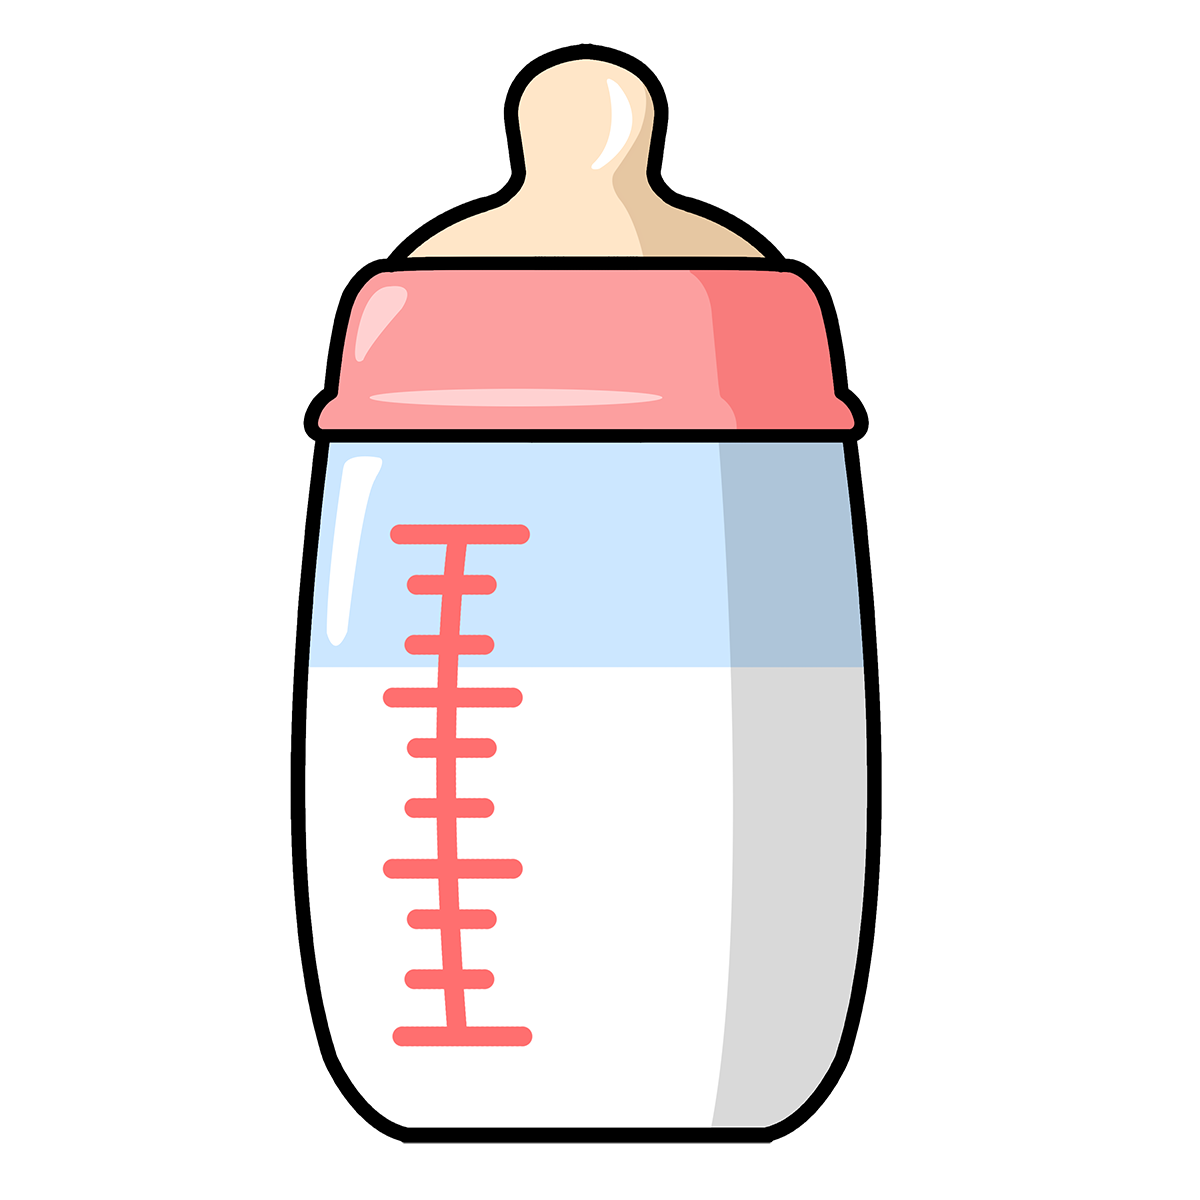 Baby Stuff Clip Art - ClipArt Best